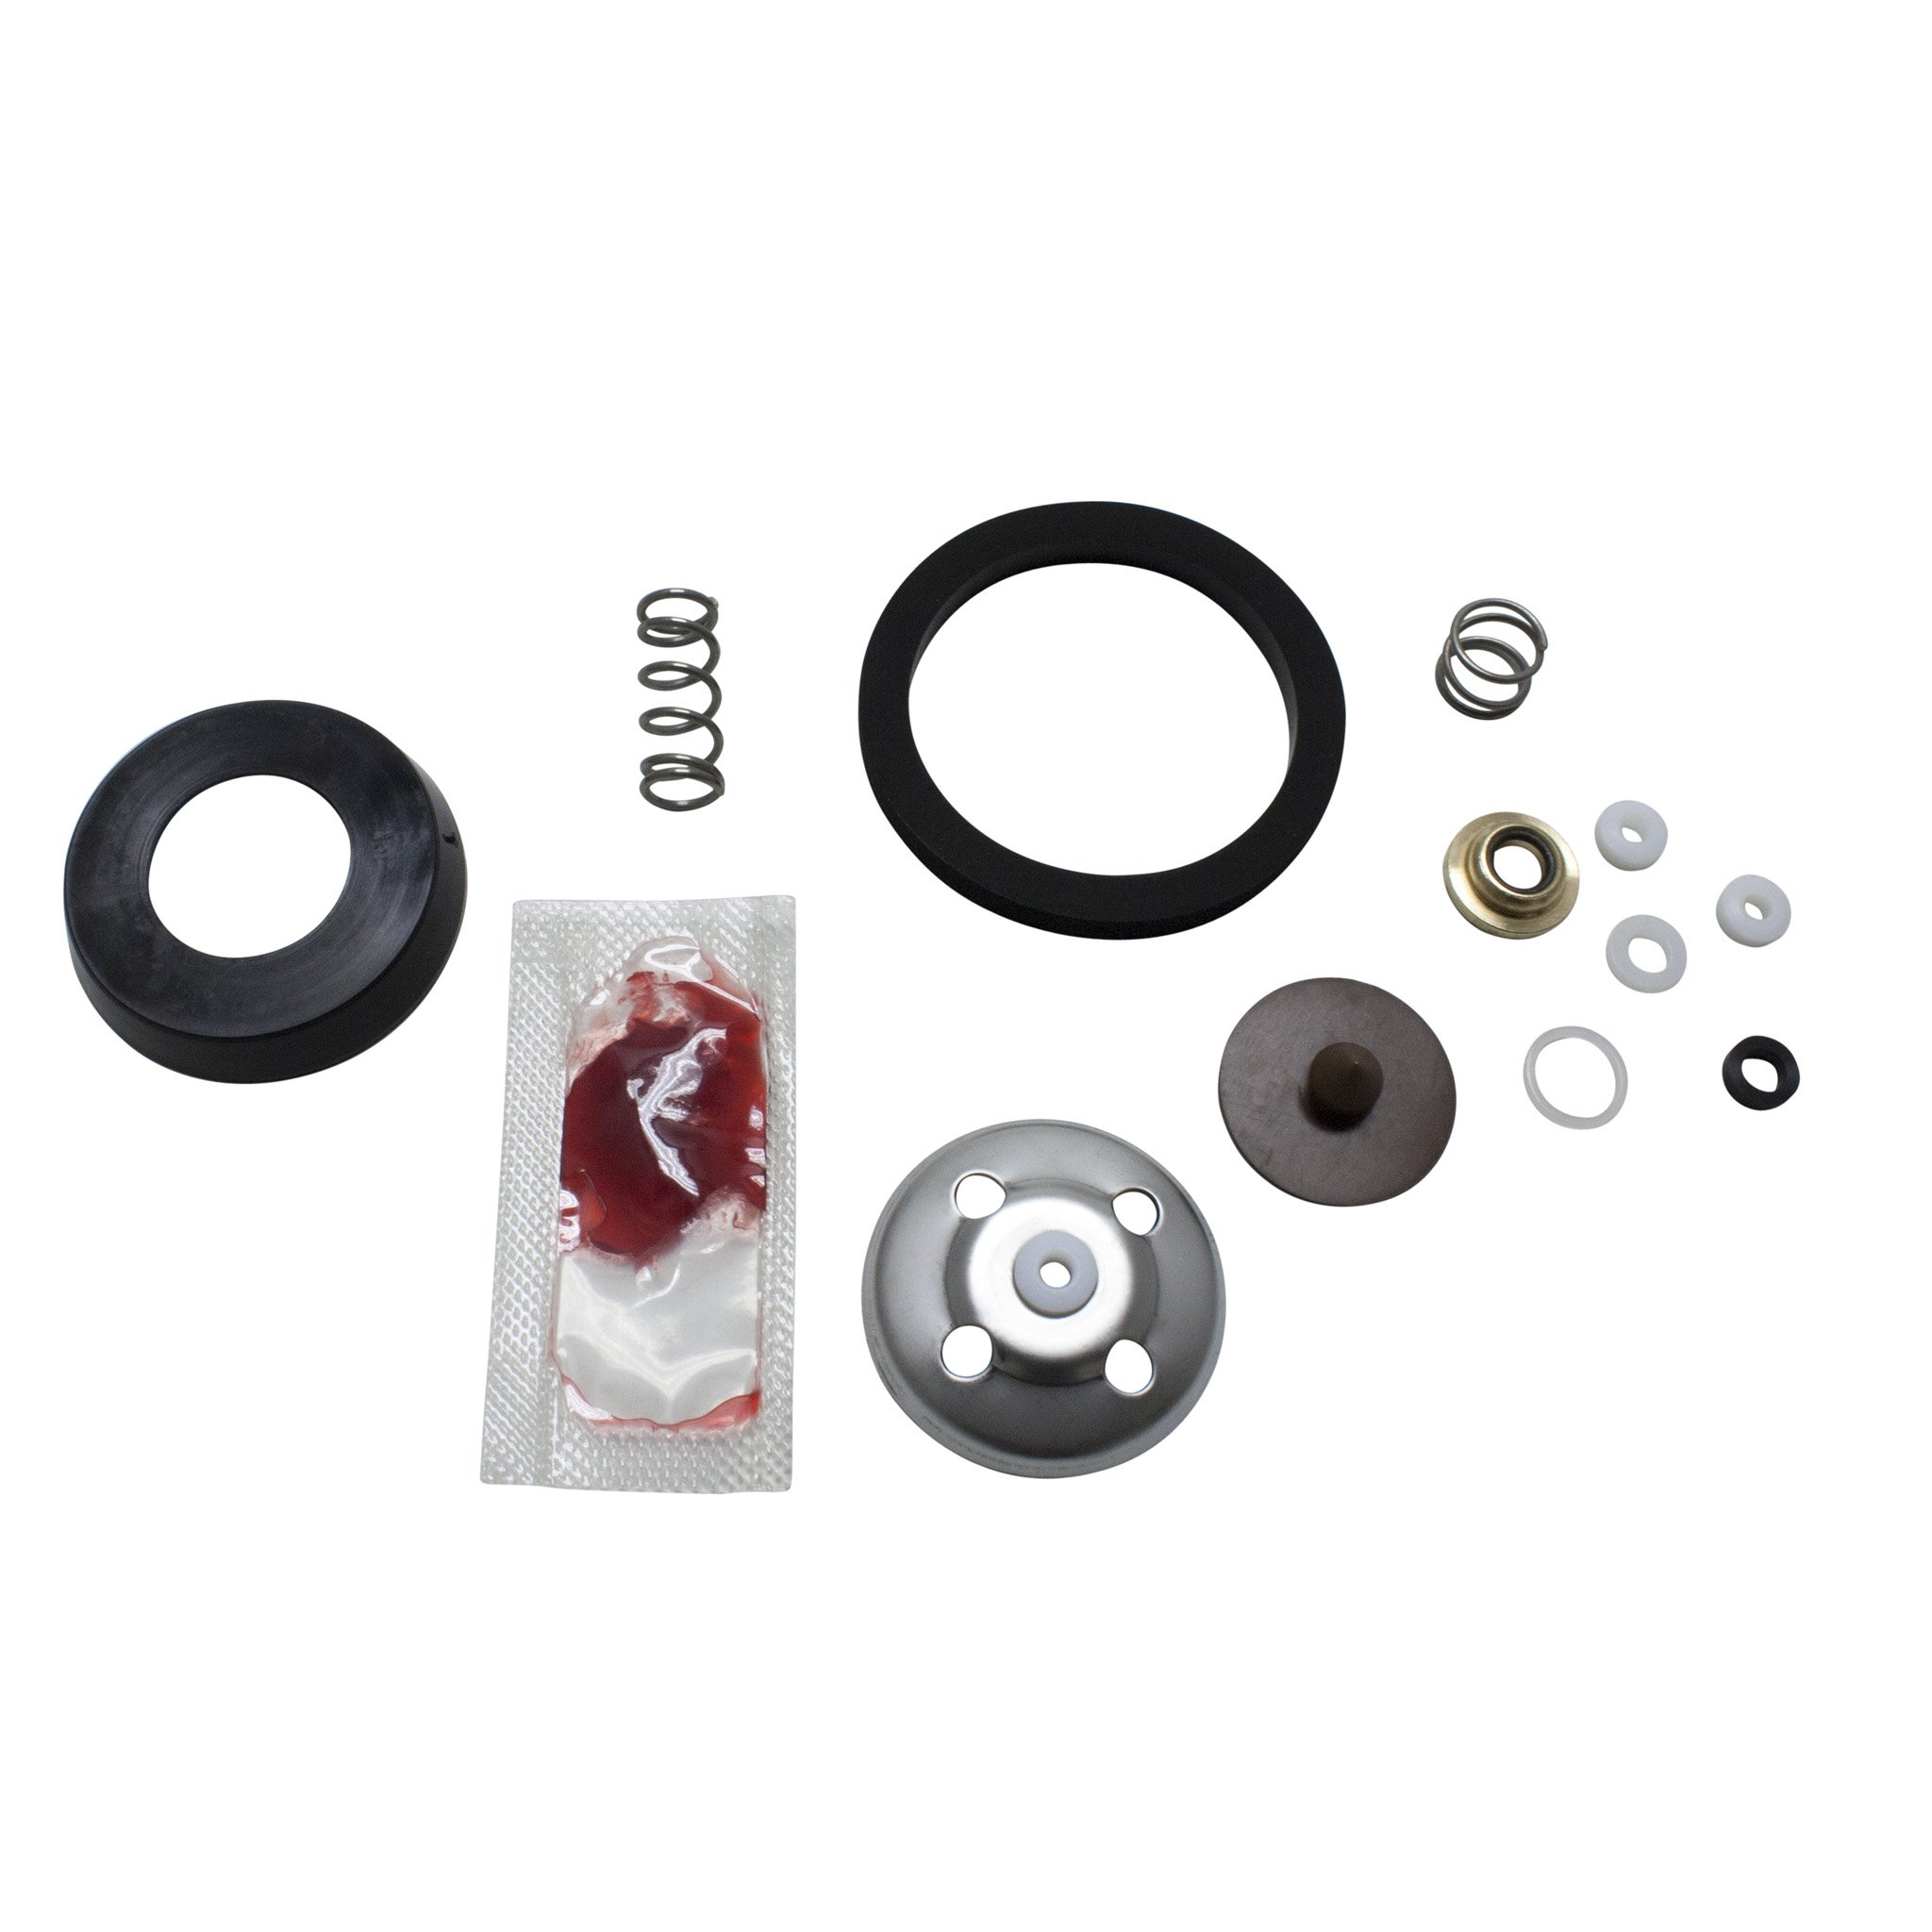 B & G Gasket Repair Kit GD-124 BG2012 by B&G